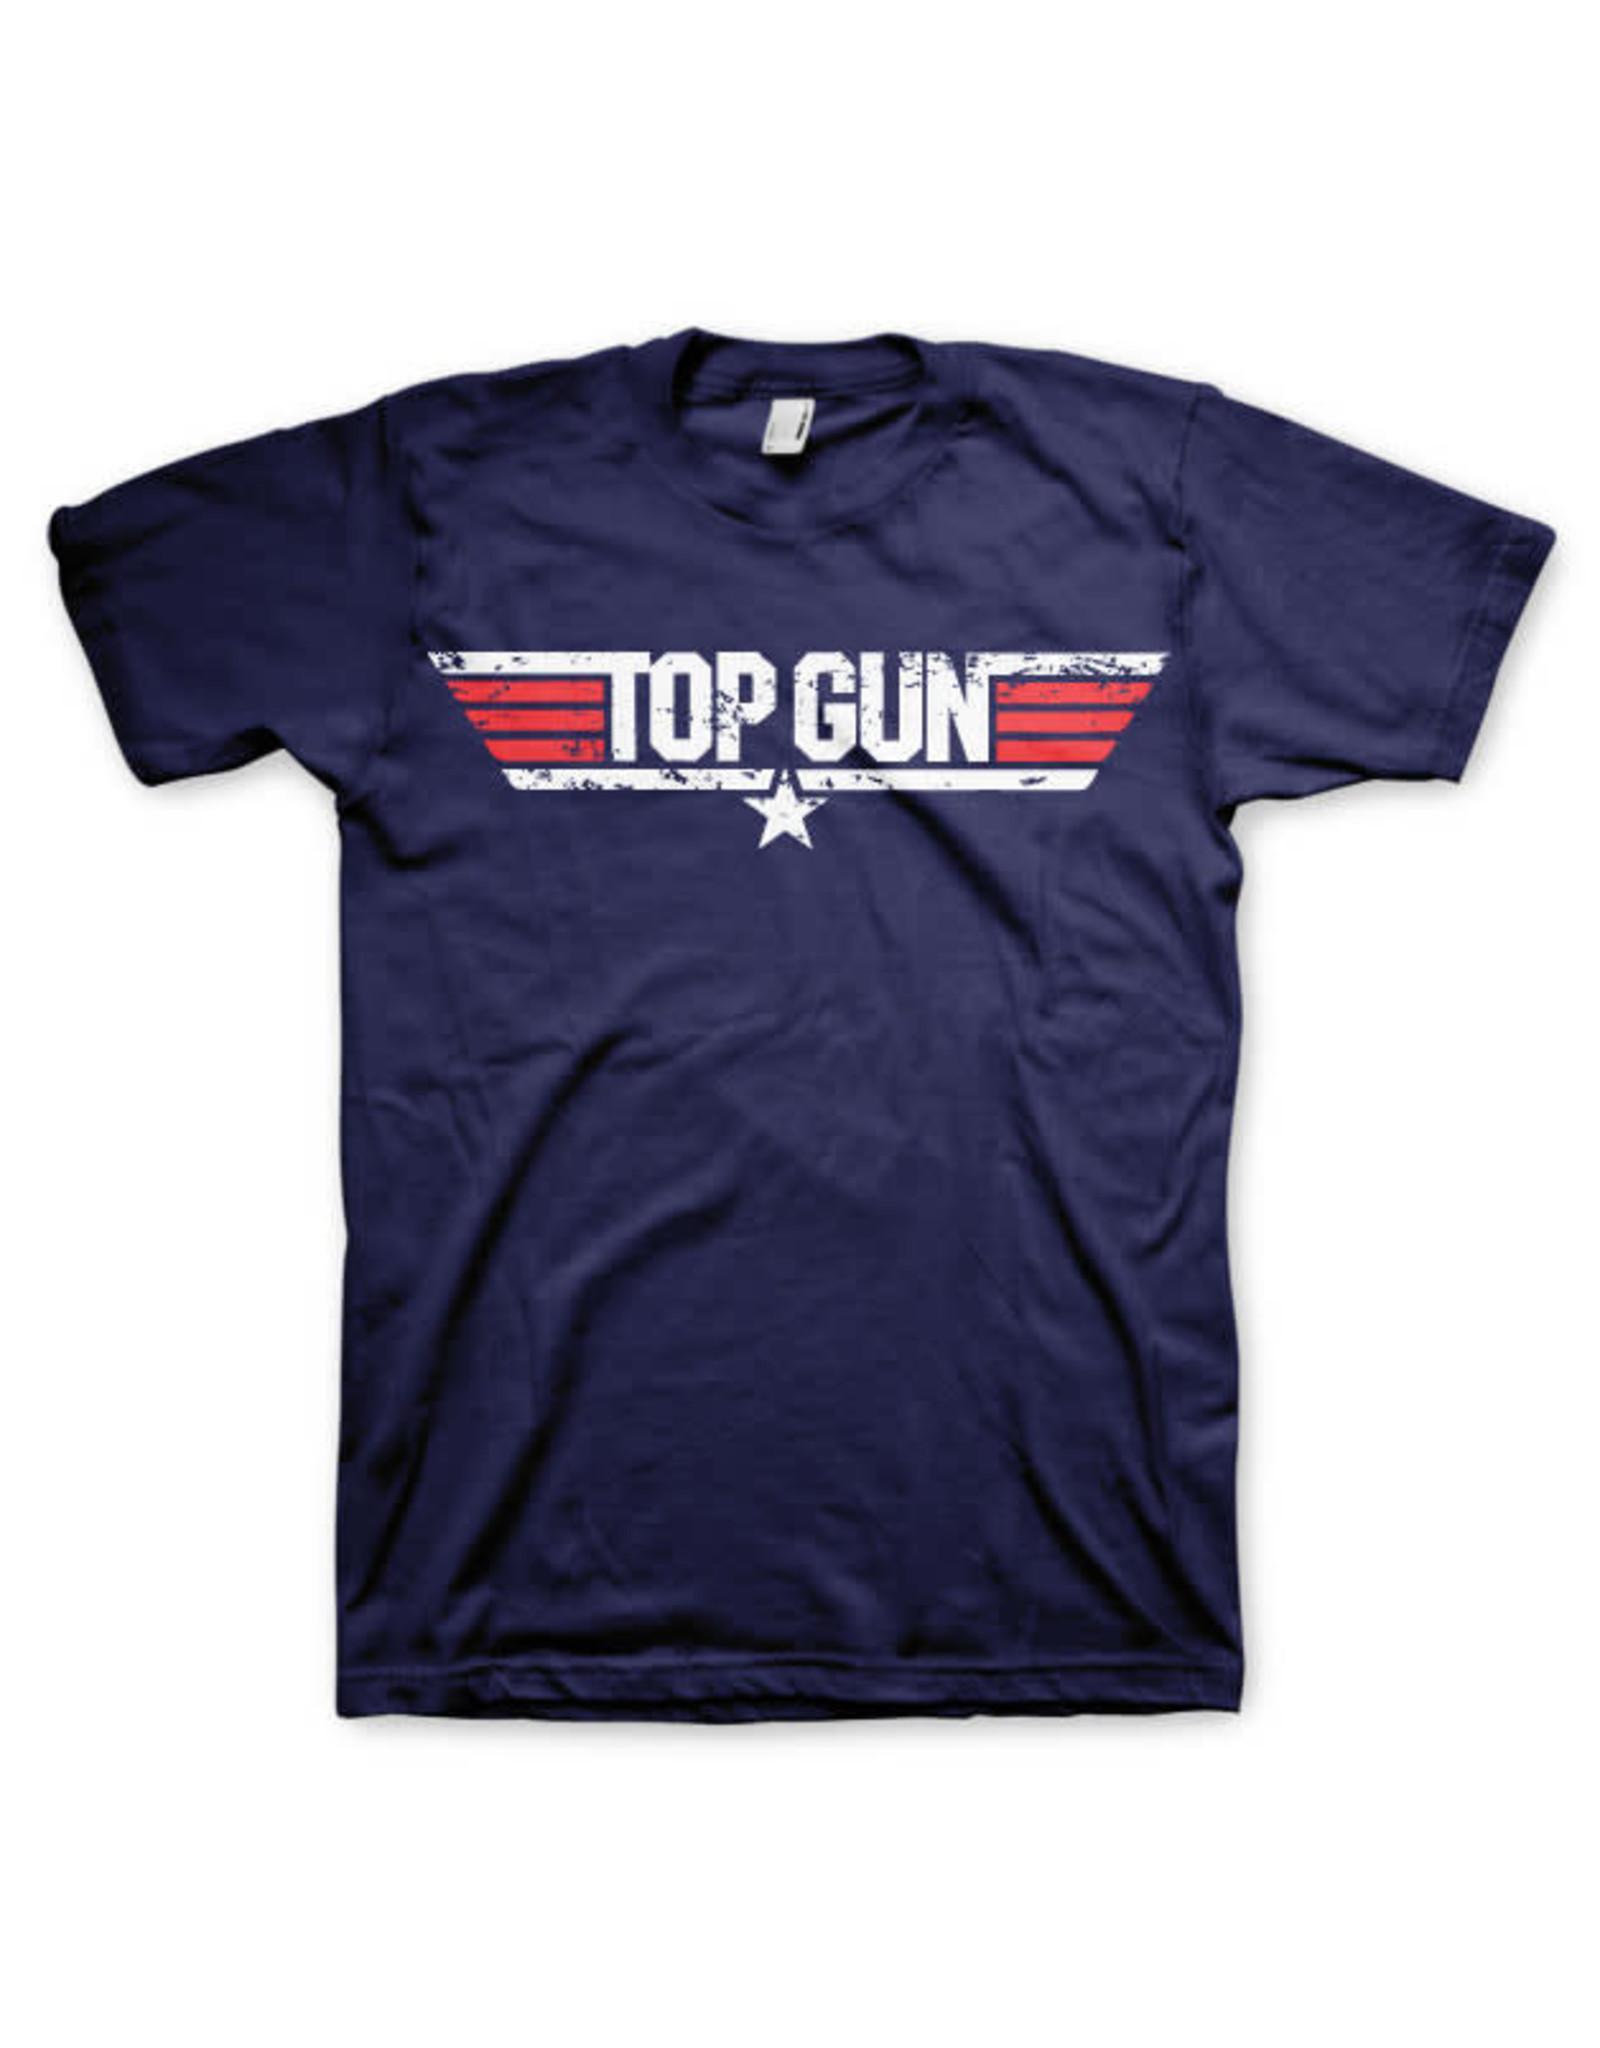 TOP GUN - T-Shirt Distressed Logo - Navy (L)